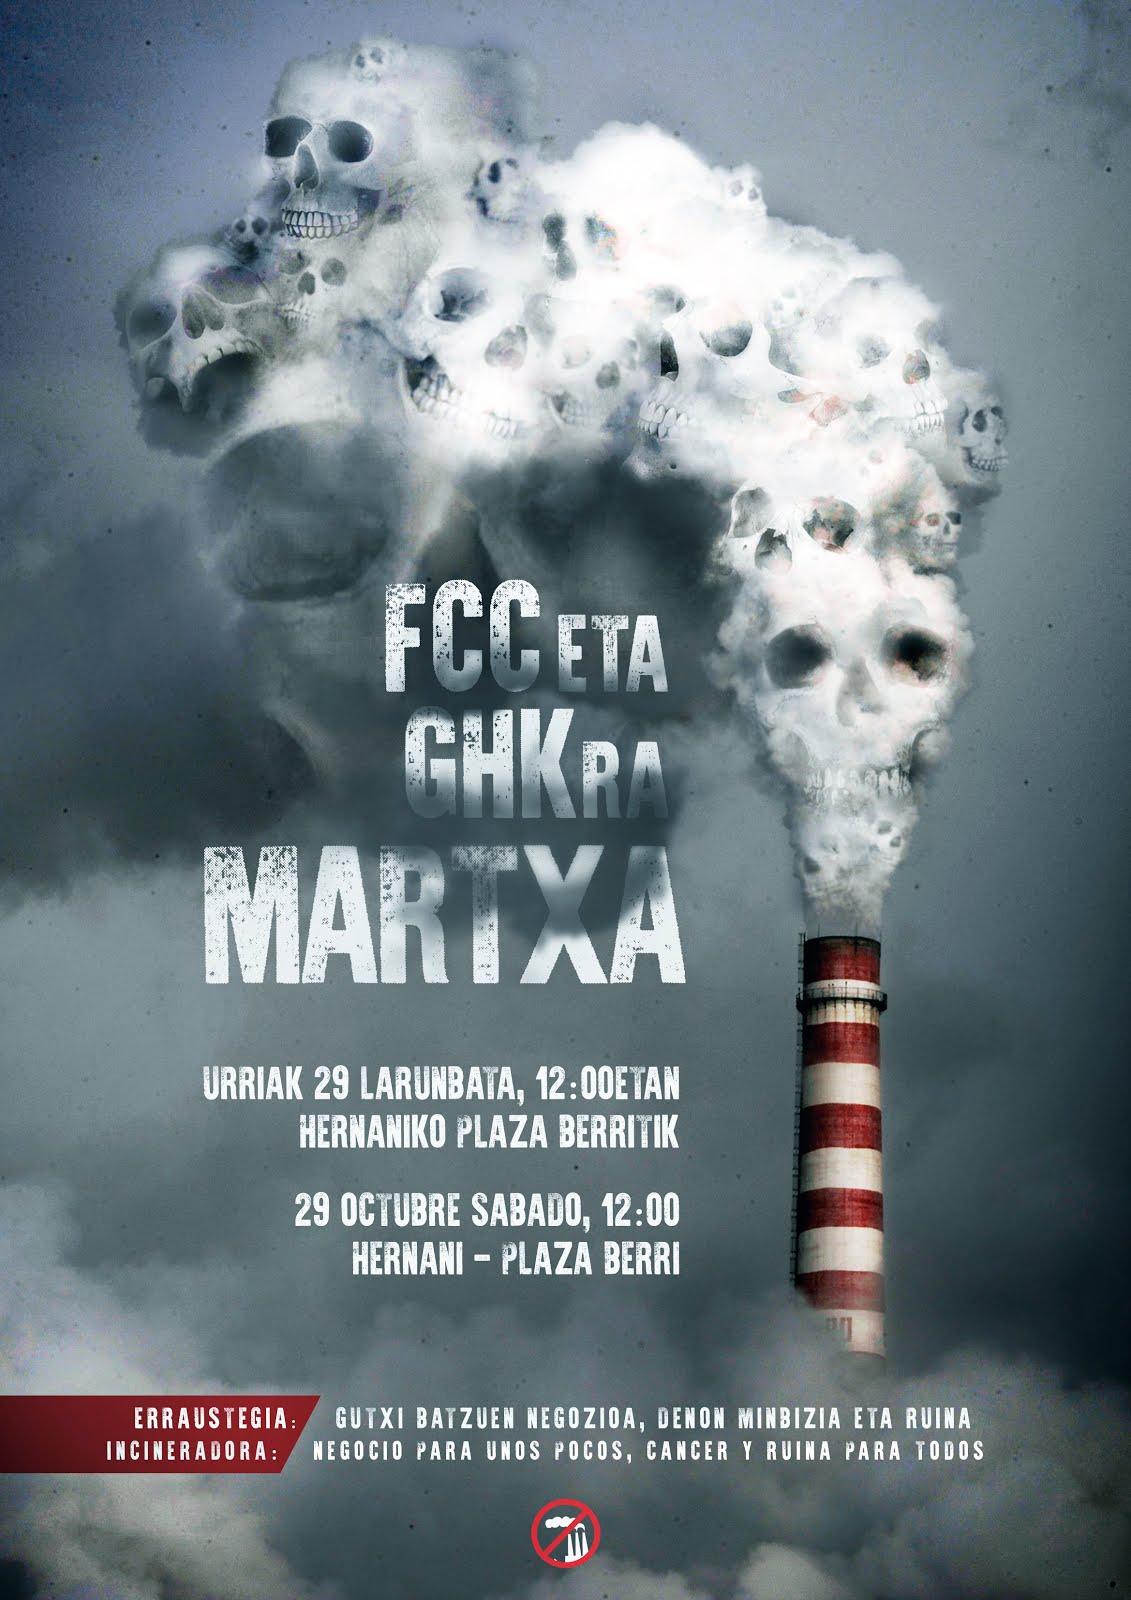 FCC eta GHKra MARTXA